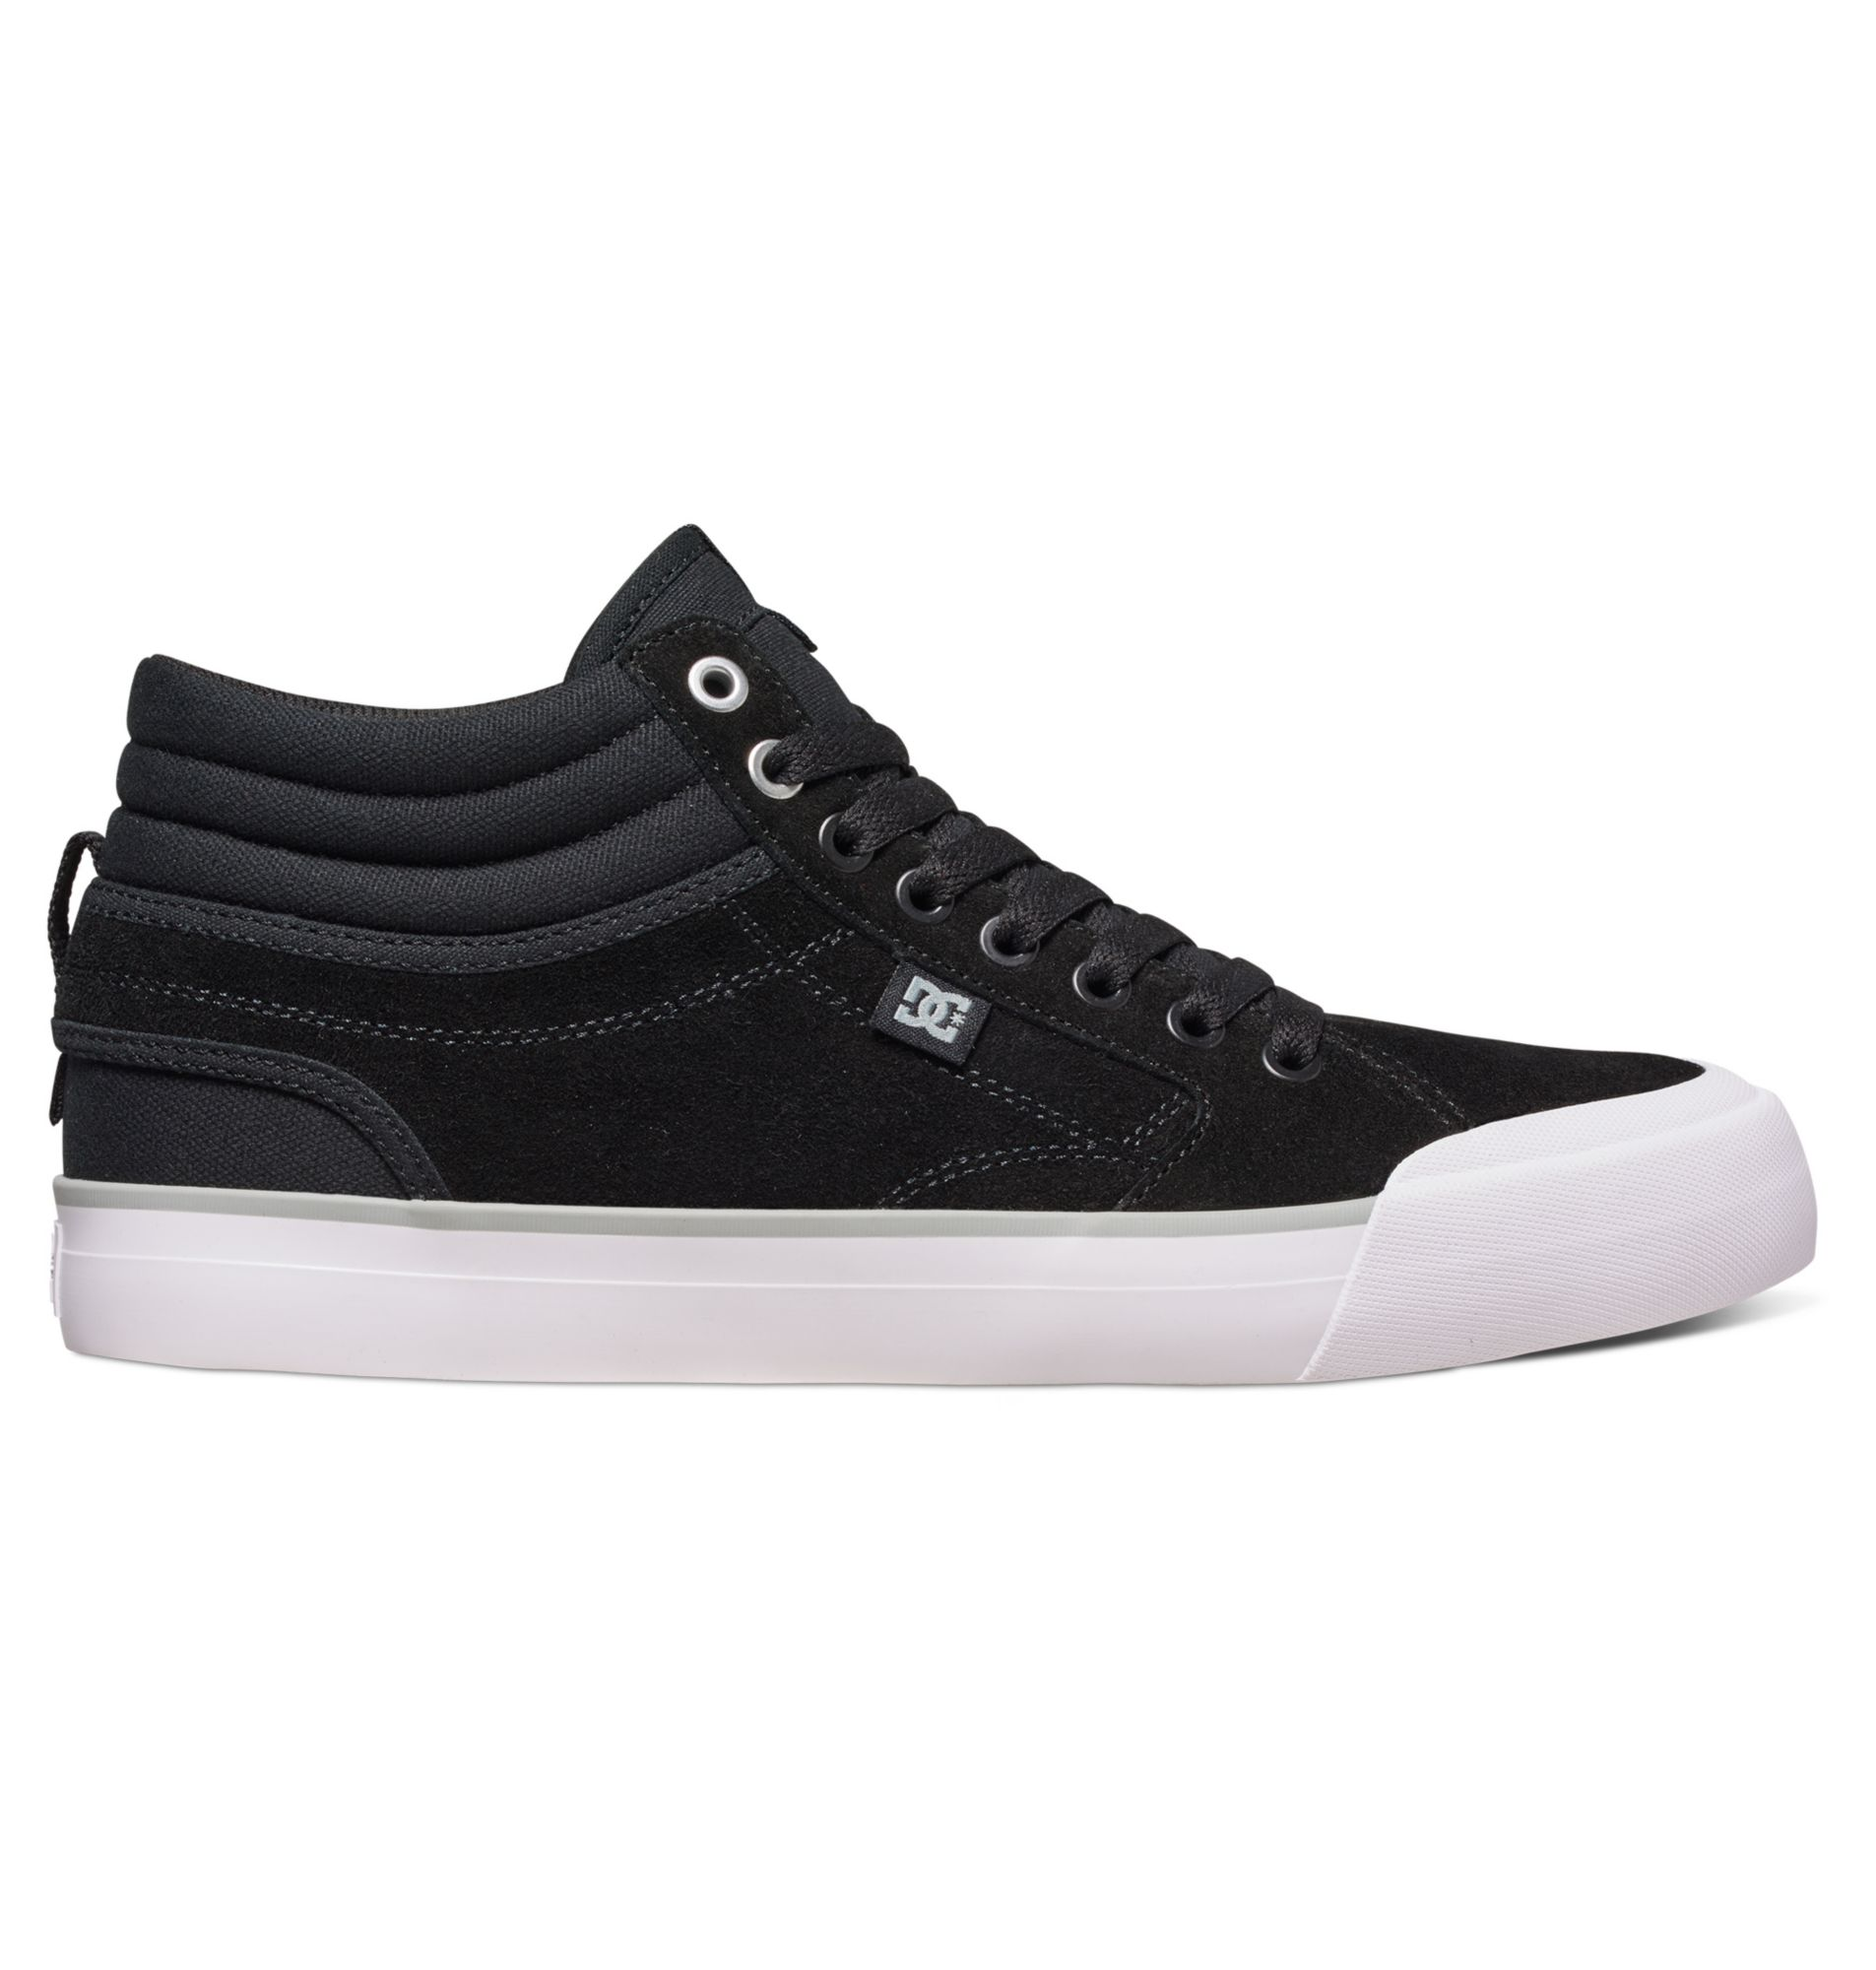 DC SHOES DC Shoes High-Top Skate Schuhe »Evan Smith HI S - High-Top Skate Schuhe«